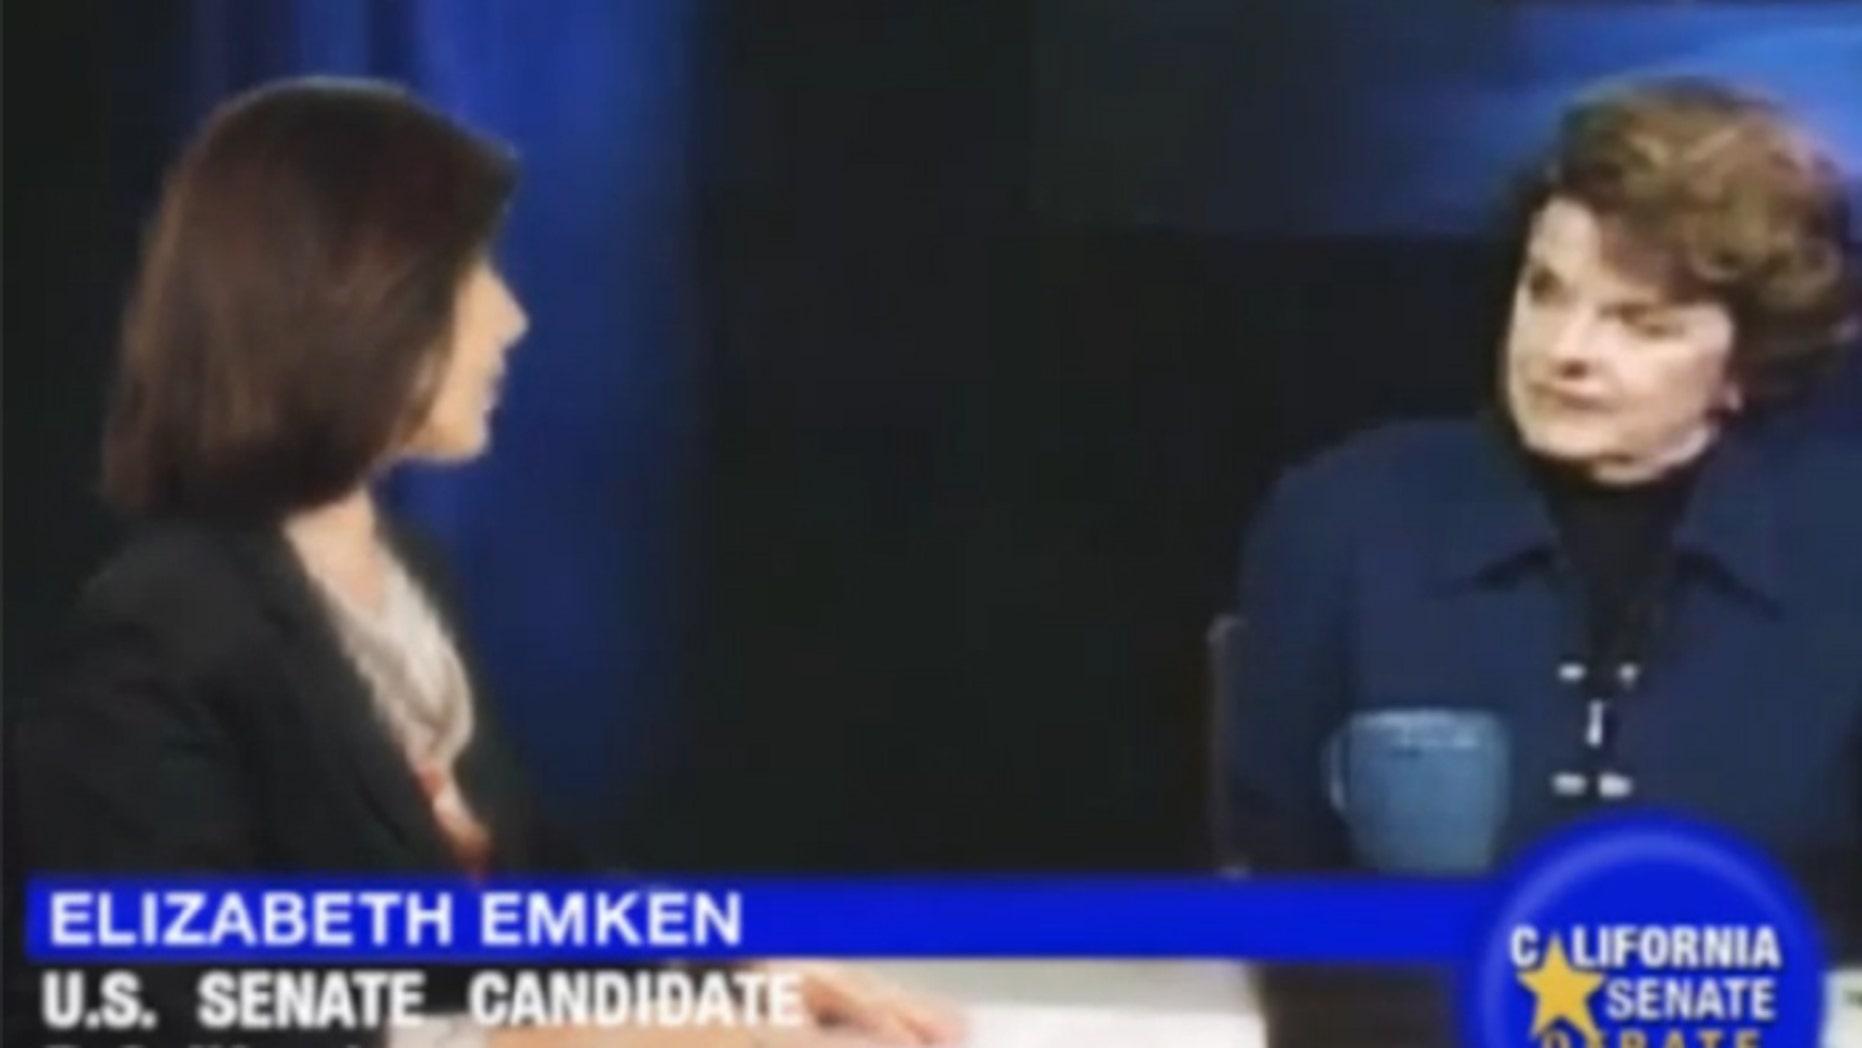 In this screen grab of the YouTube video, challenger Elizabeth Emken, left, debates a virtual version of Sen. Feinstein.